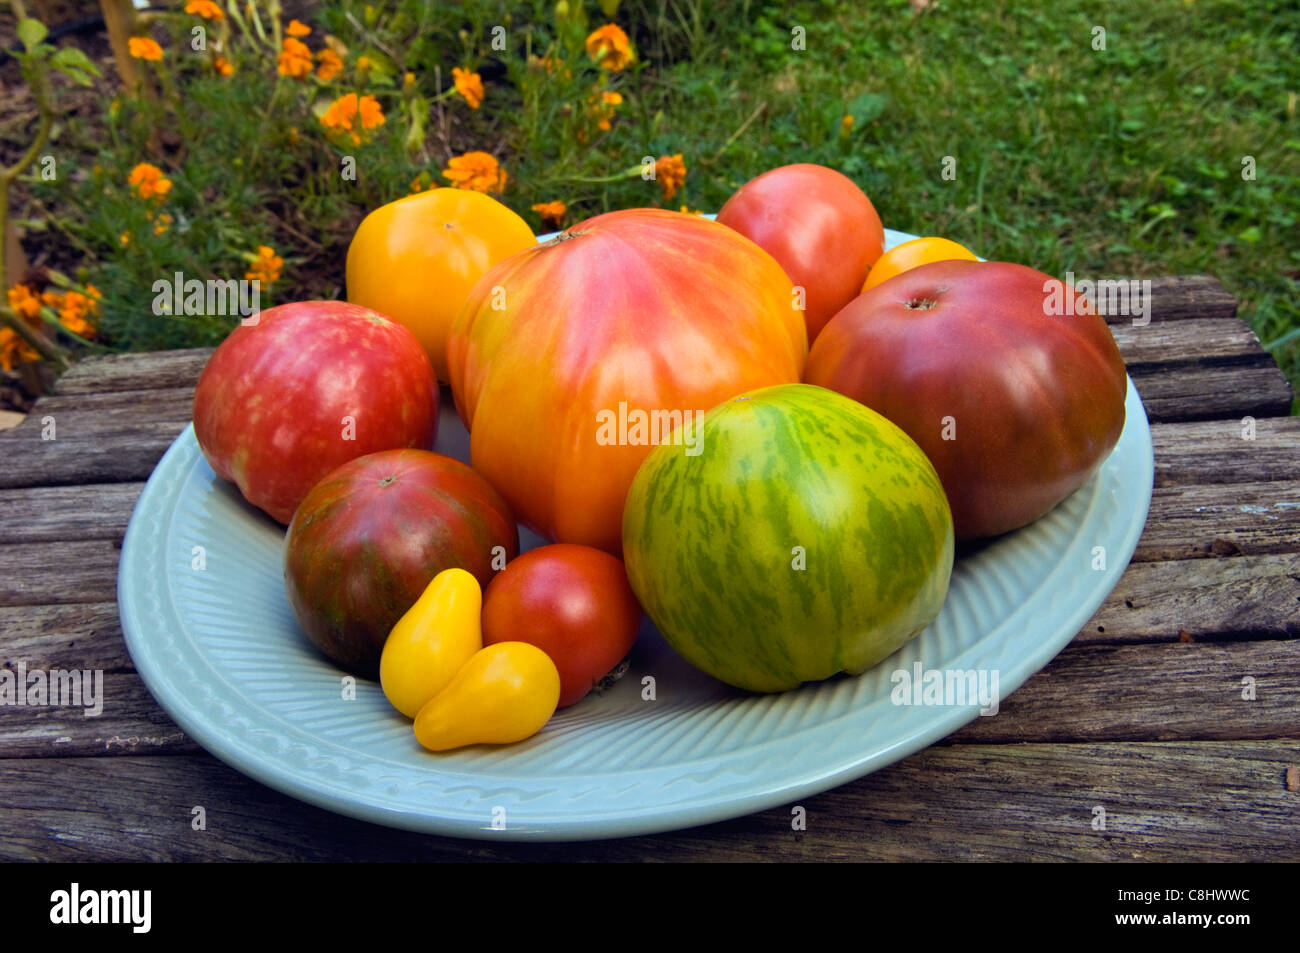 Different Varieties of Heirloom Tomatoes on Plate in Garden - Stock Image